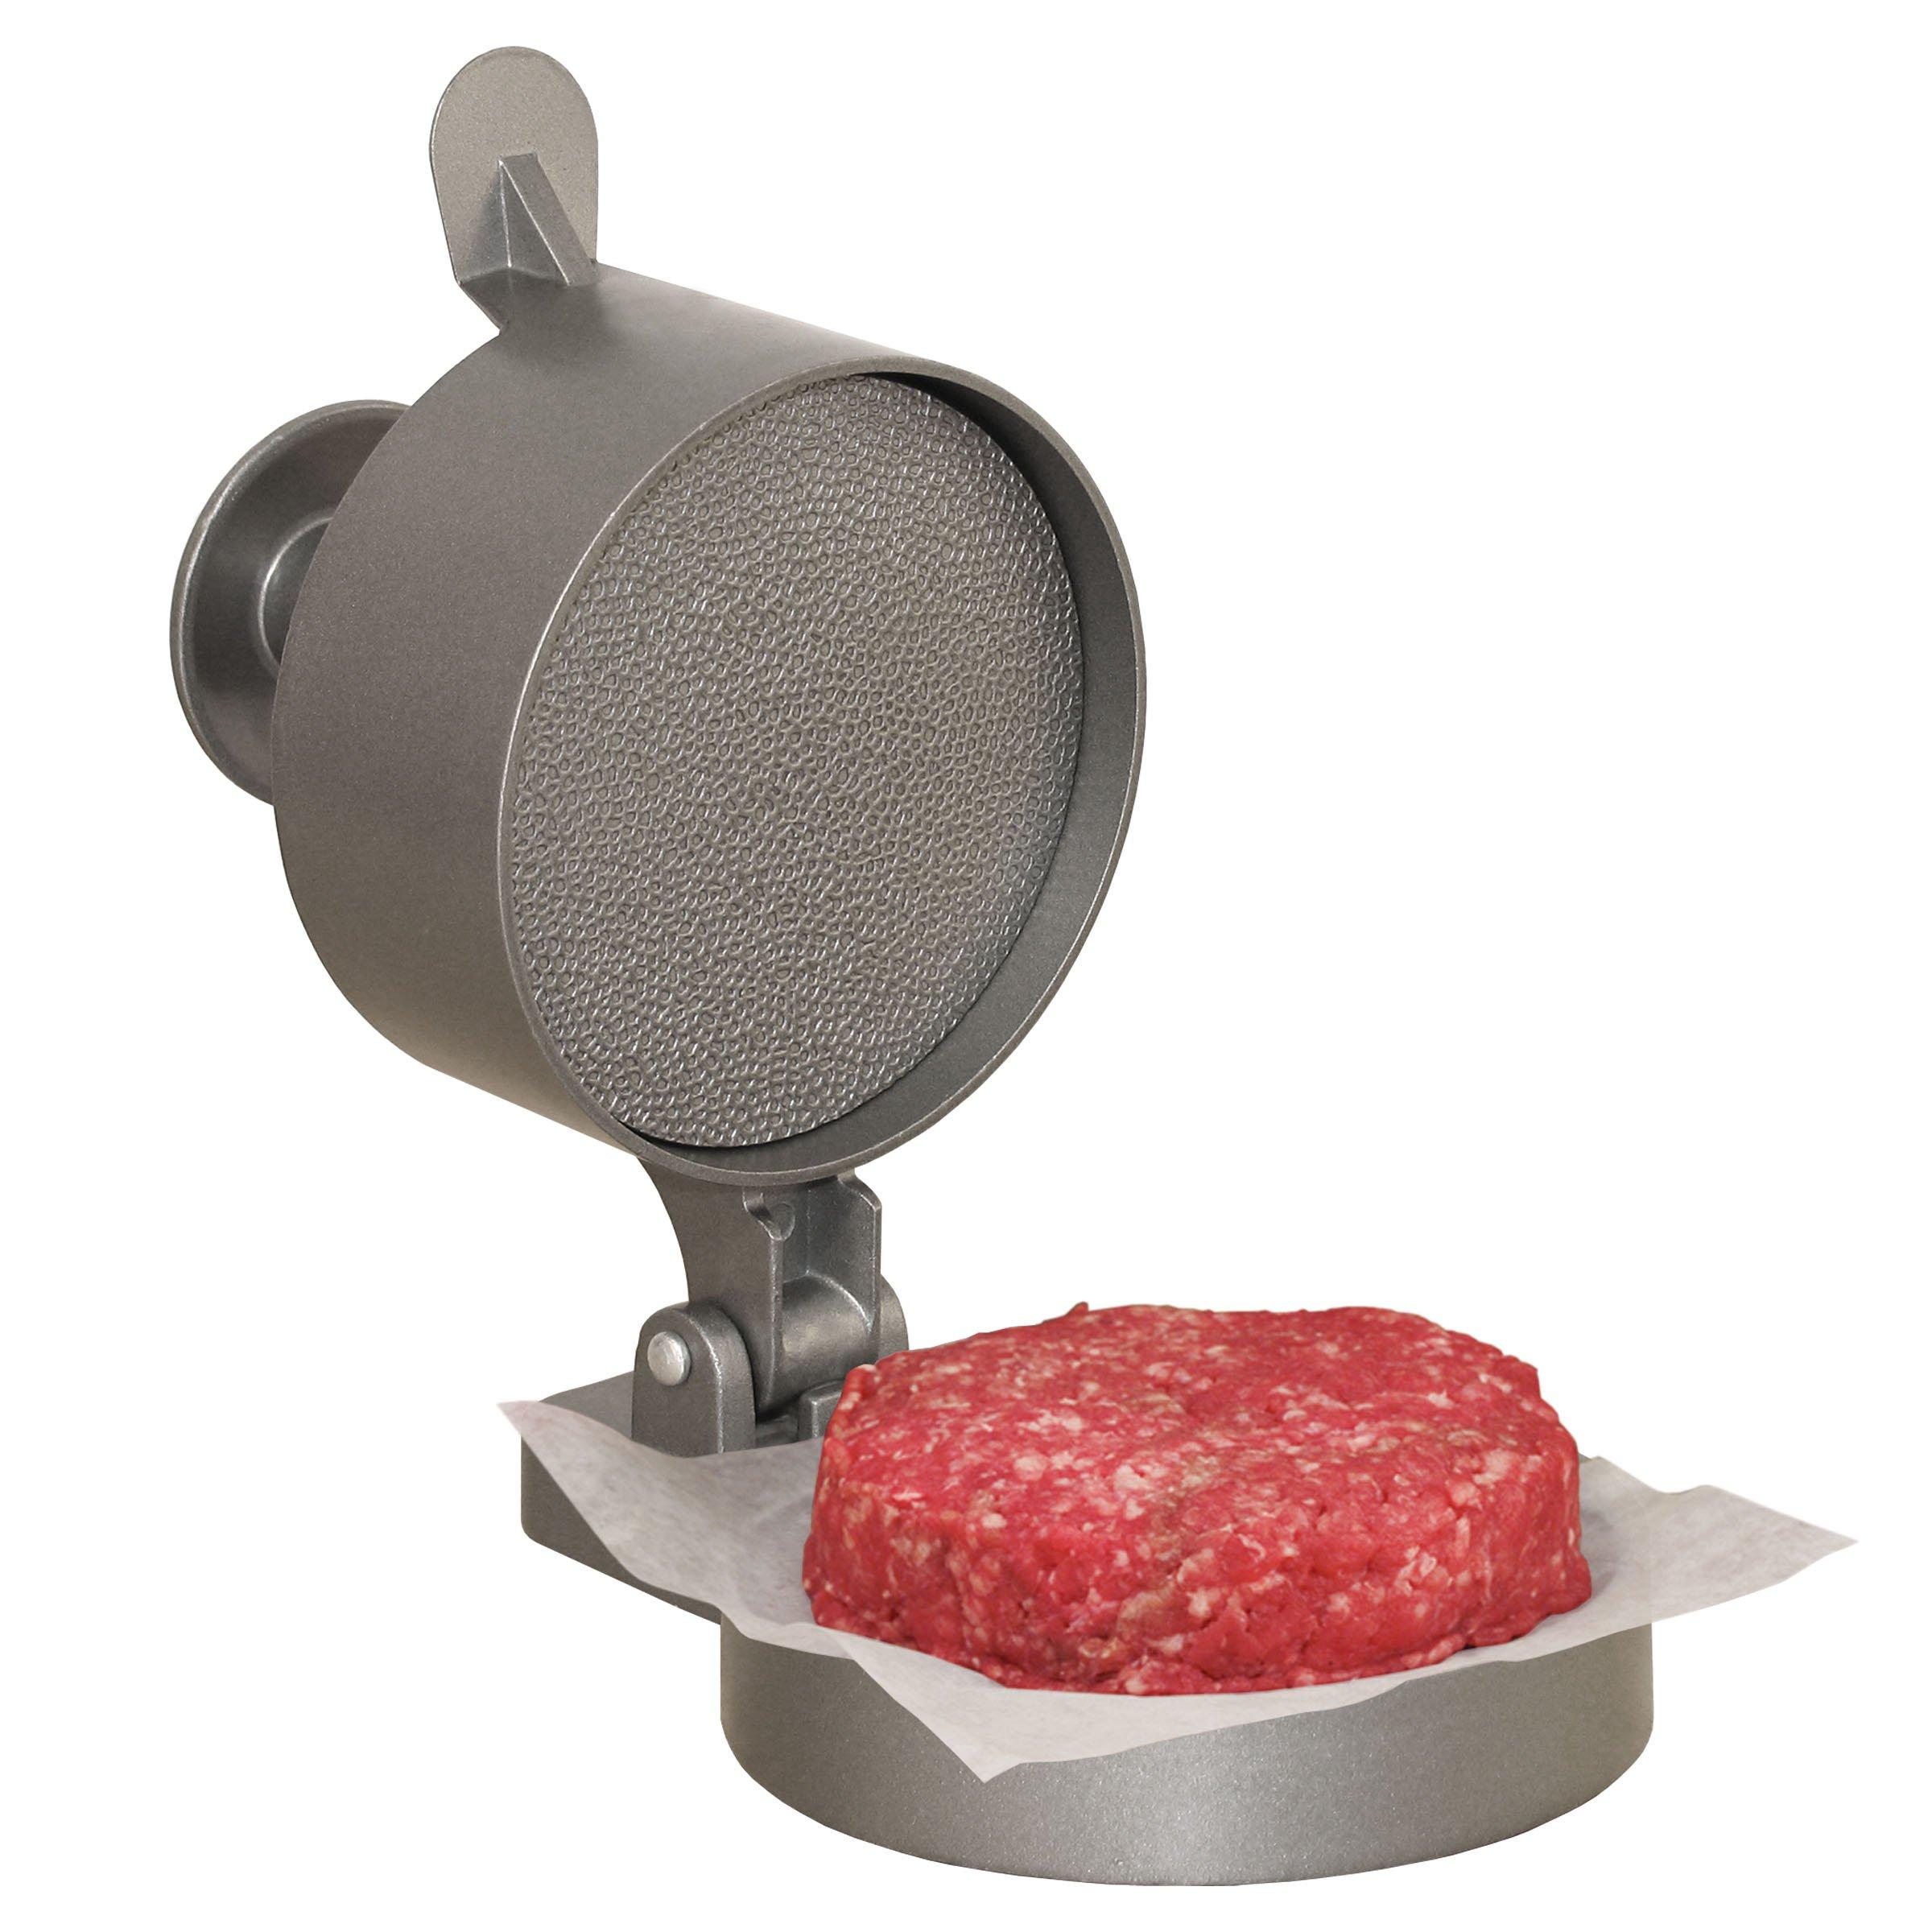 Weston Burger Express Hamburger Press with Patty Ejector (07-0310-W), Makes 4 1/2'' Patties, 1/4lb to 3/4lb